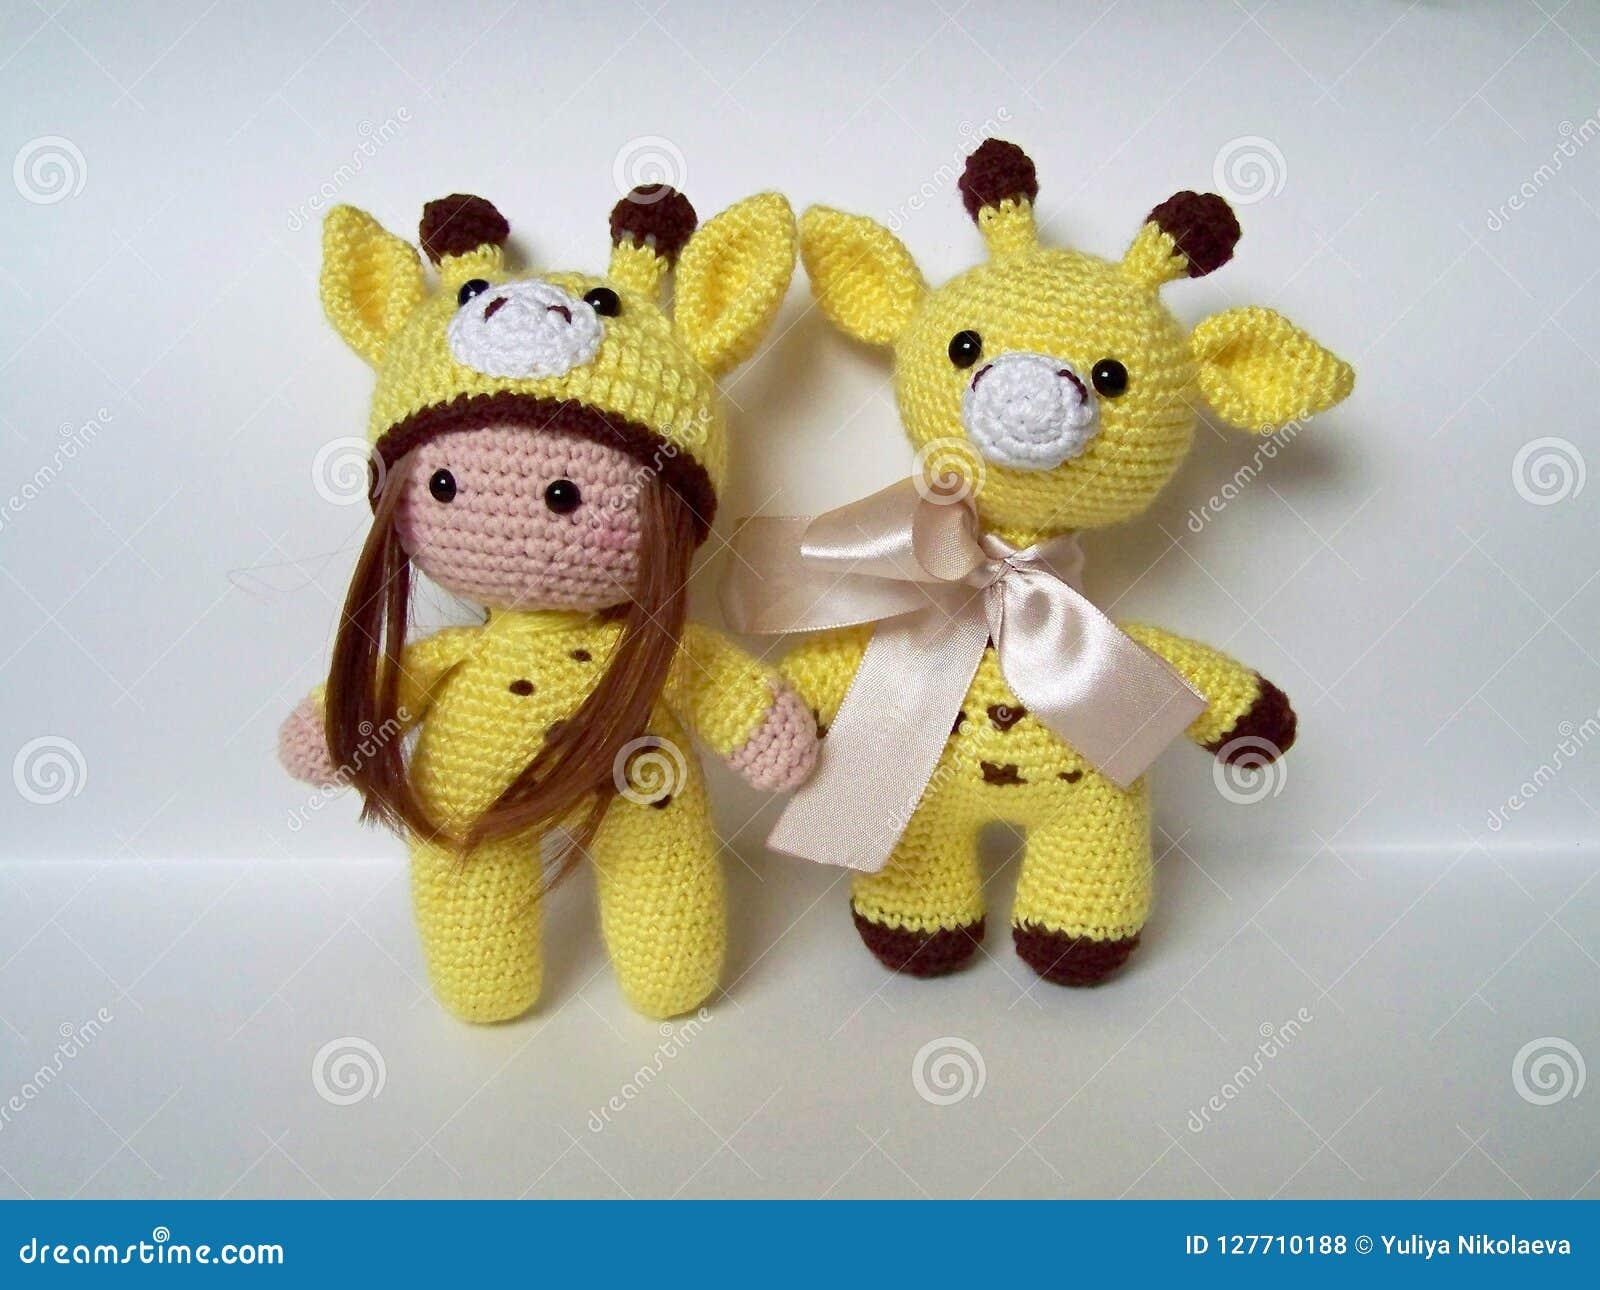 Sleeping Giraffe Amigurumi free crochet pattern - Amigu World | 1290x1600